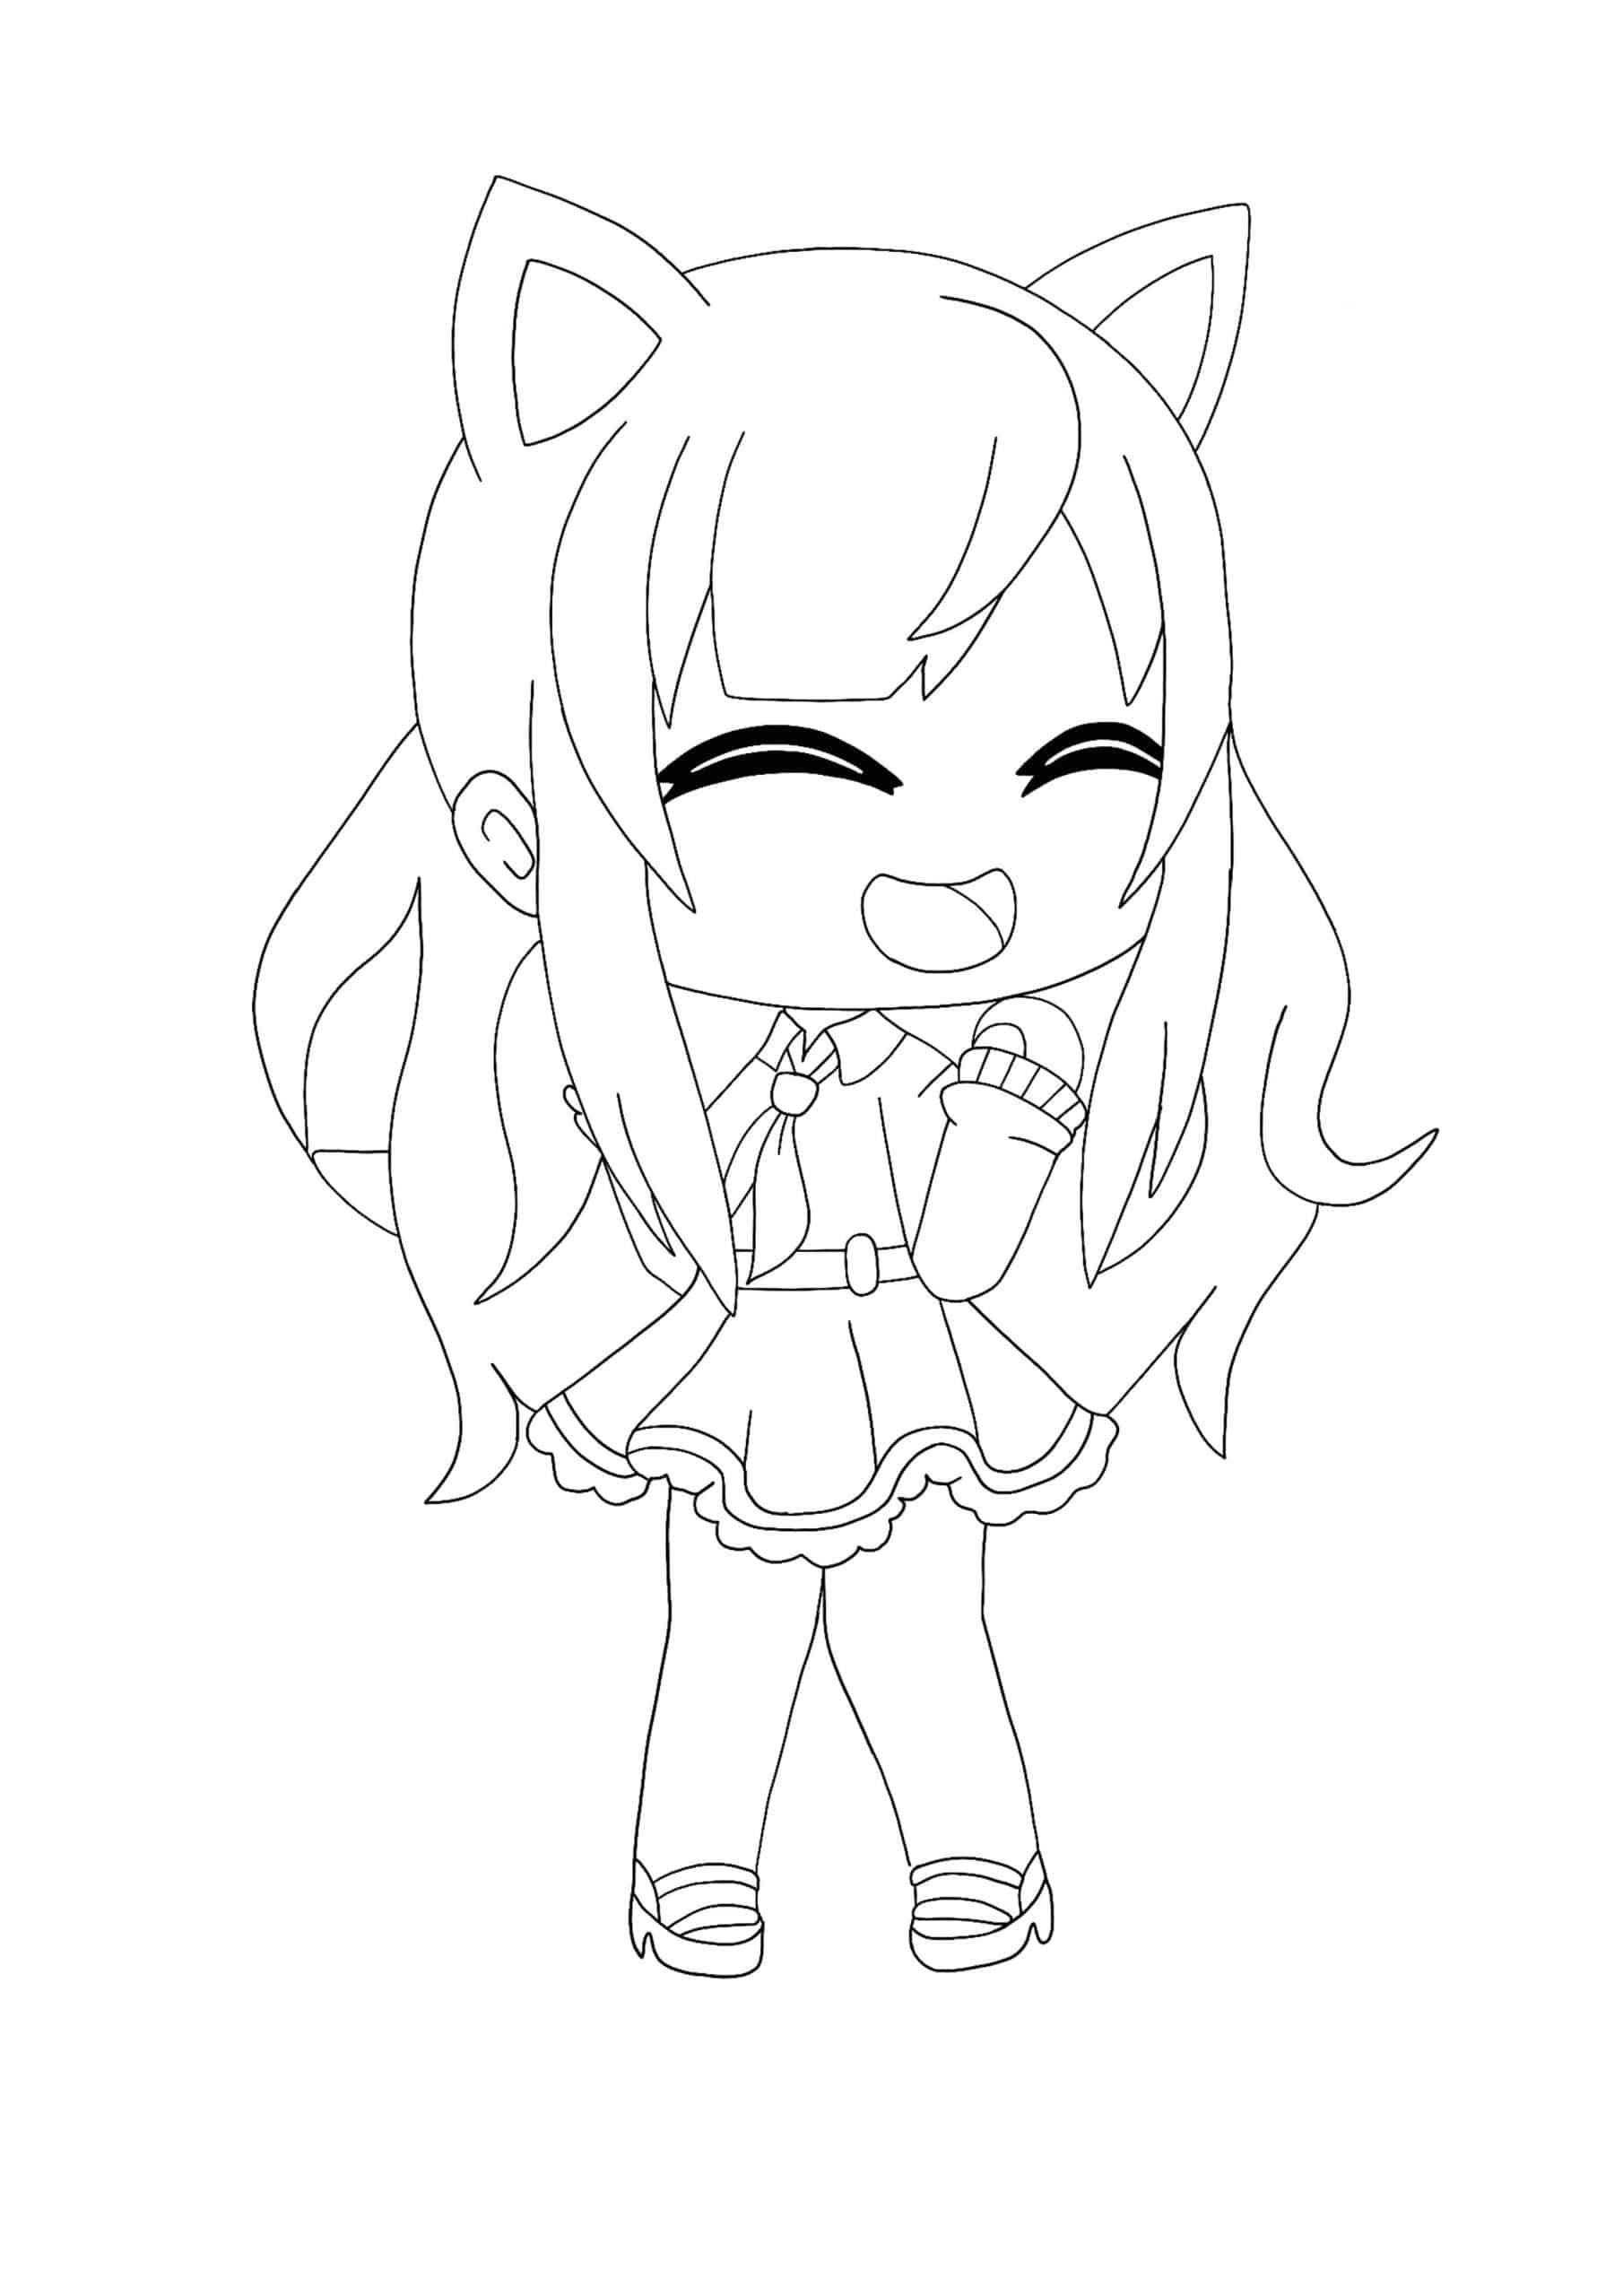 Kawaii Chan Girl coloring page  Coloring pages, Cute dragon